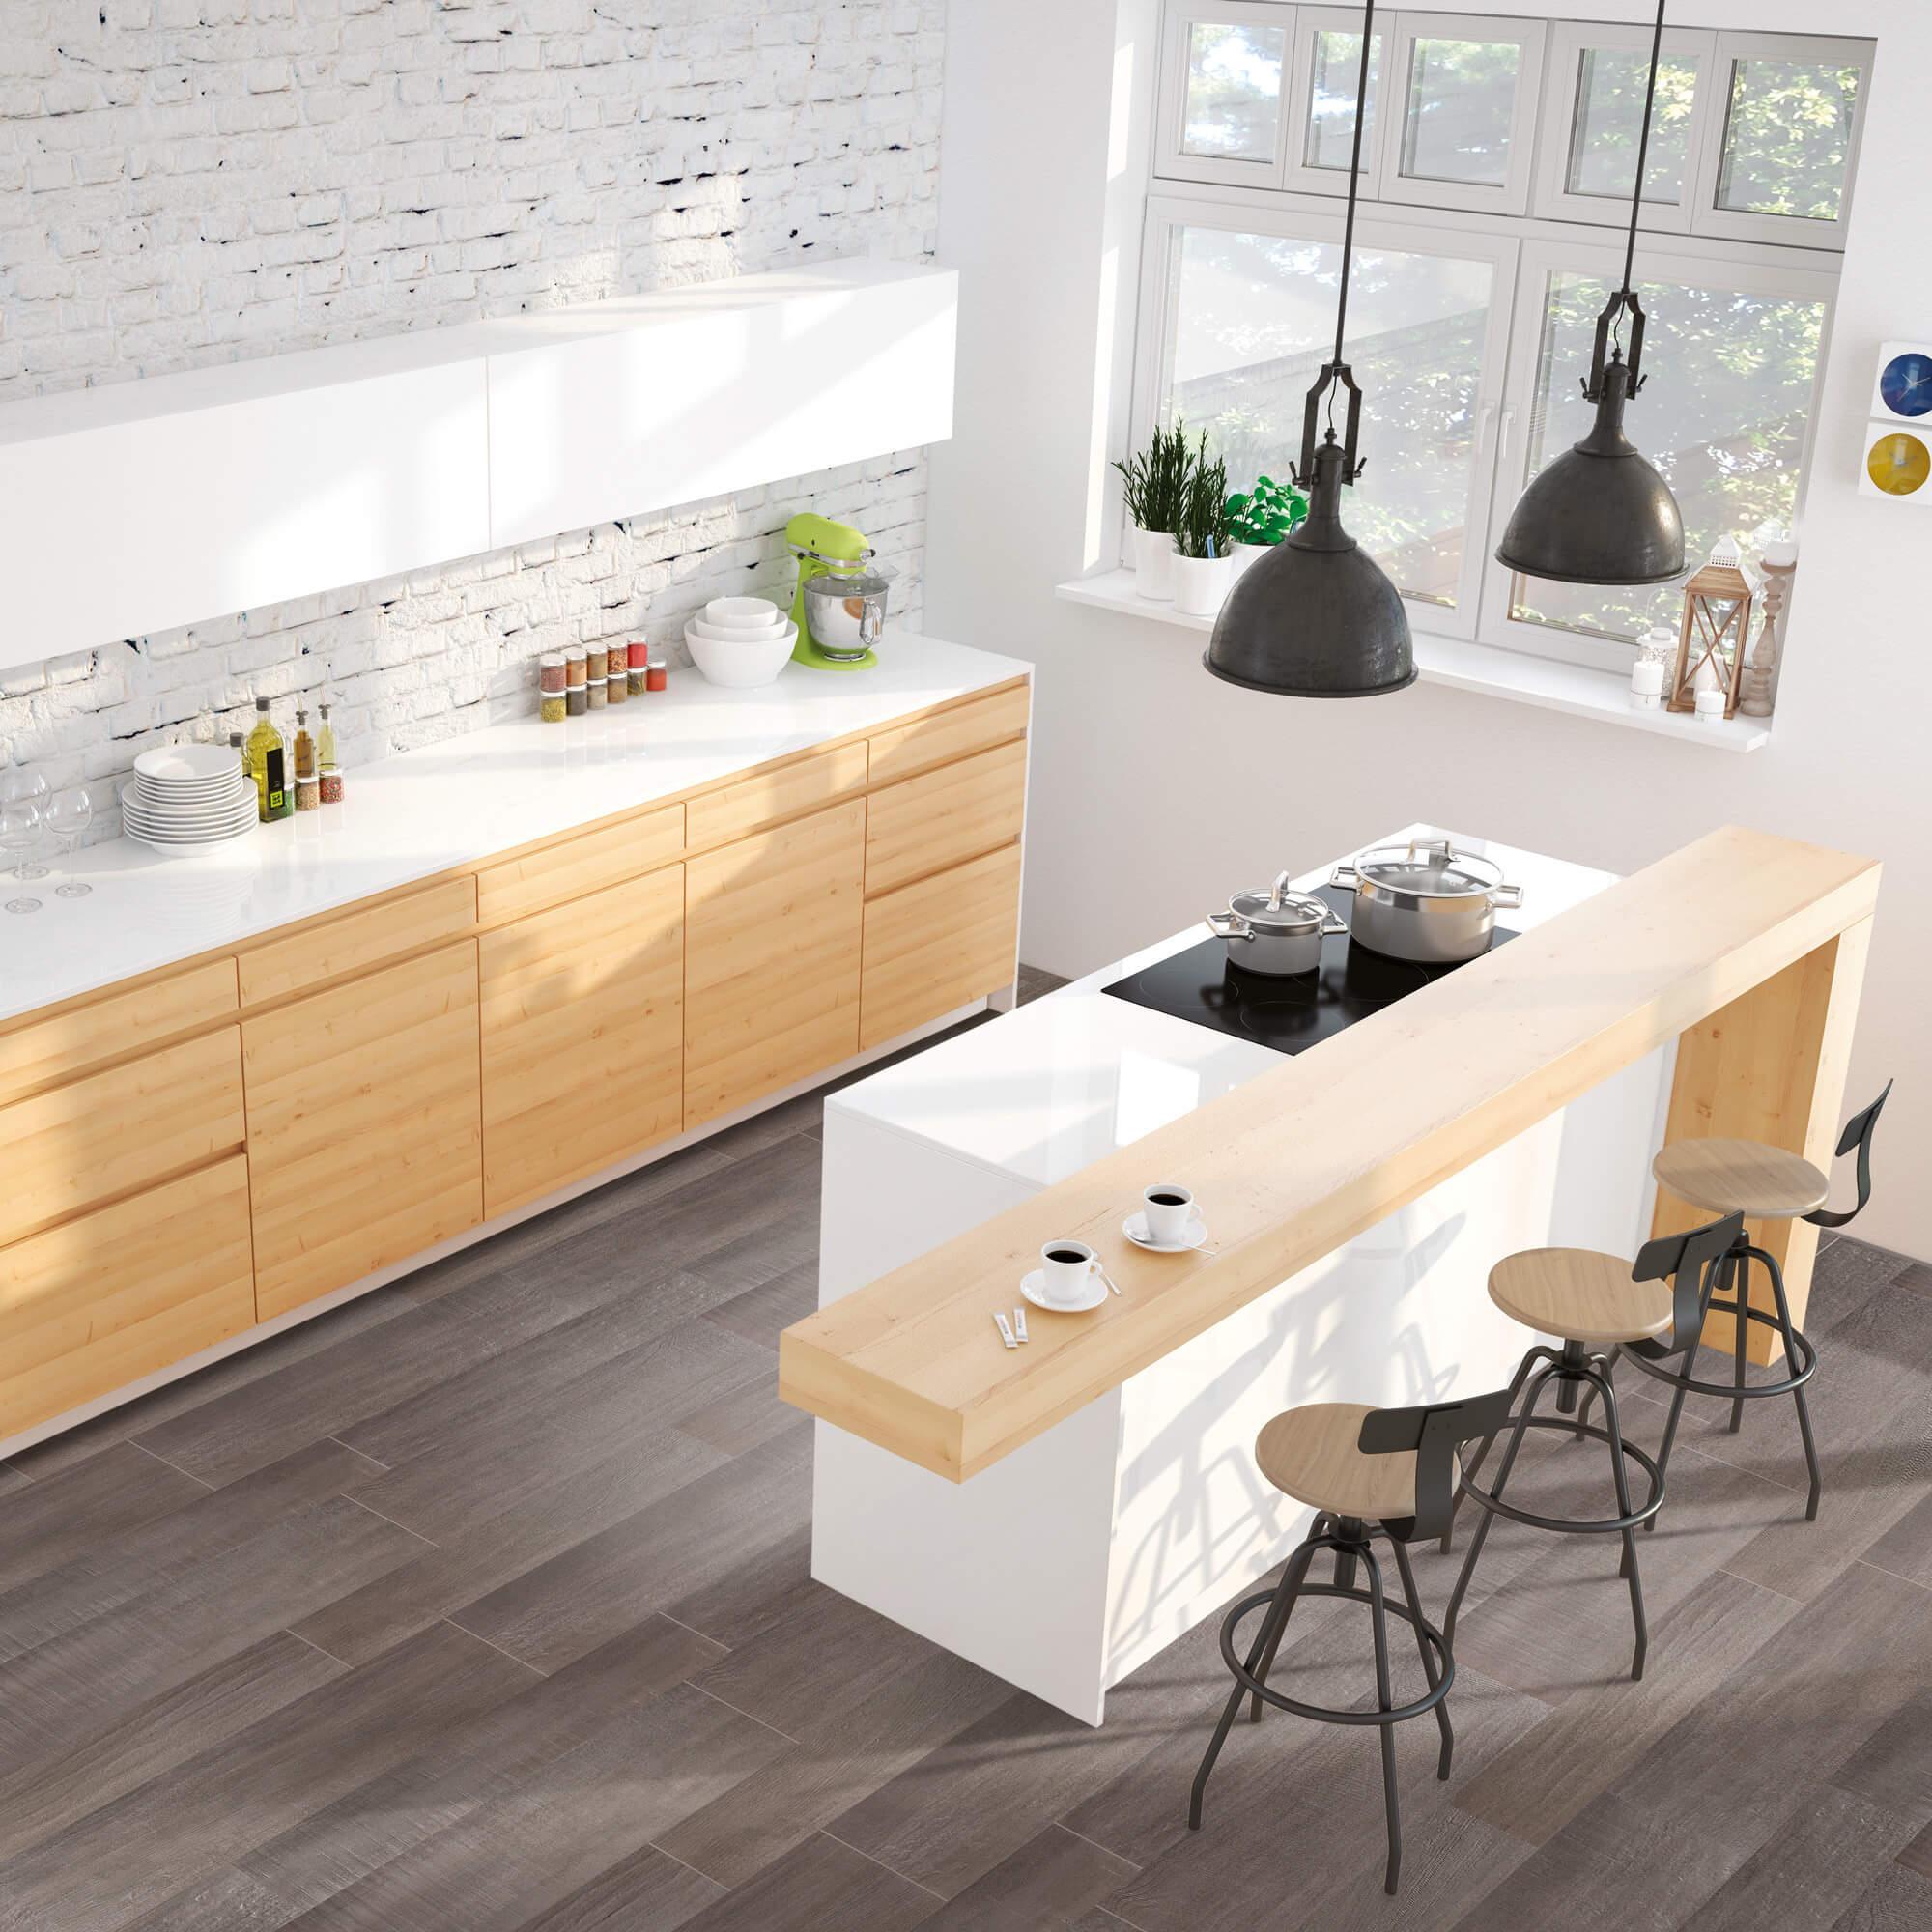 Carrelage sol et mur aspect parquet naturel Beton Wood Clay 15x90 cm